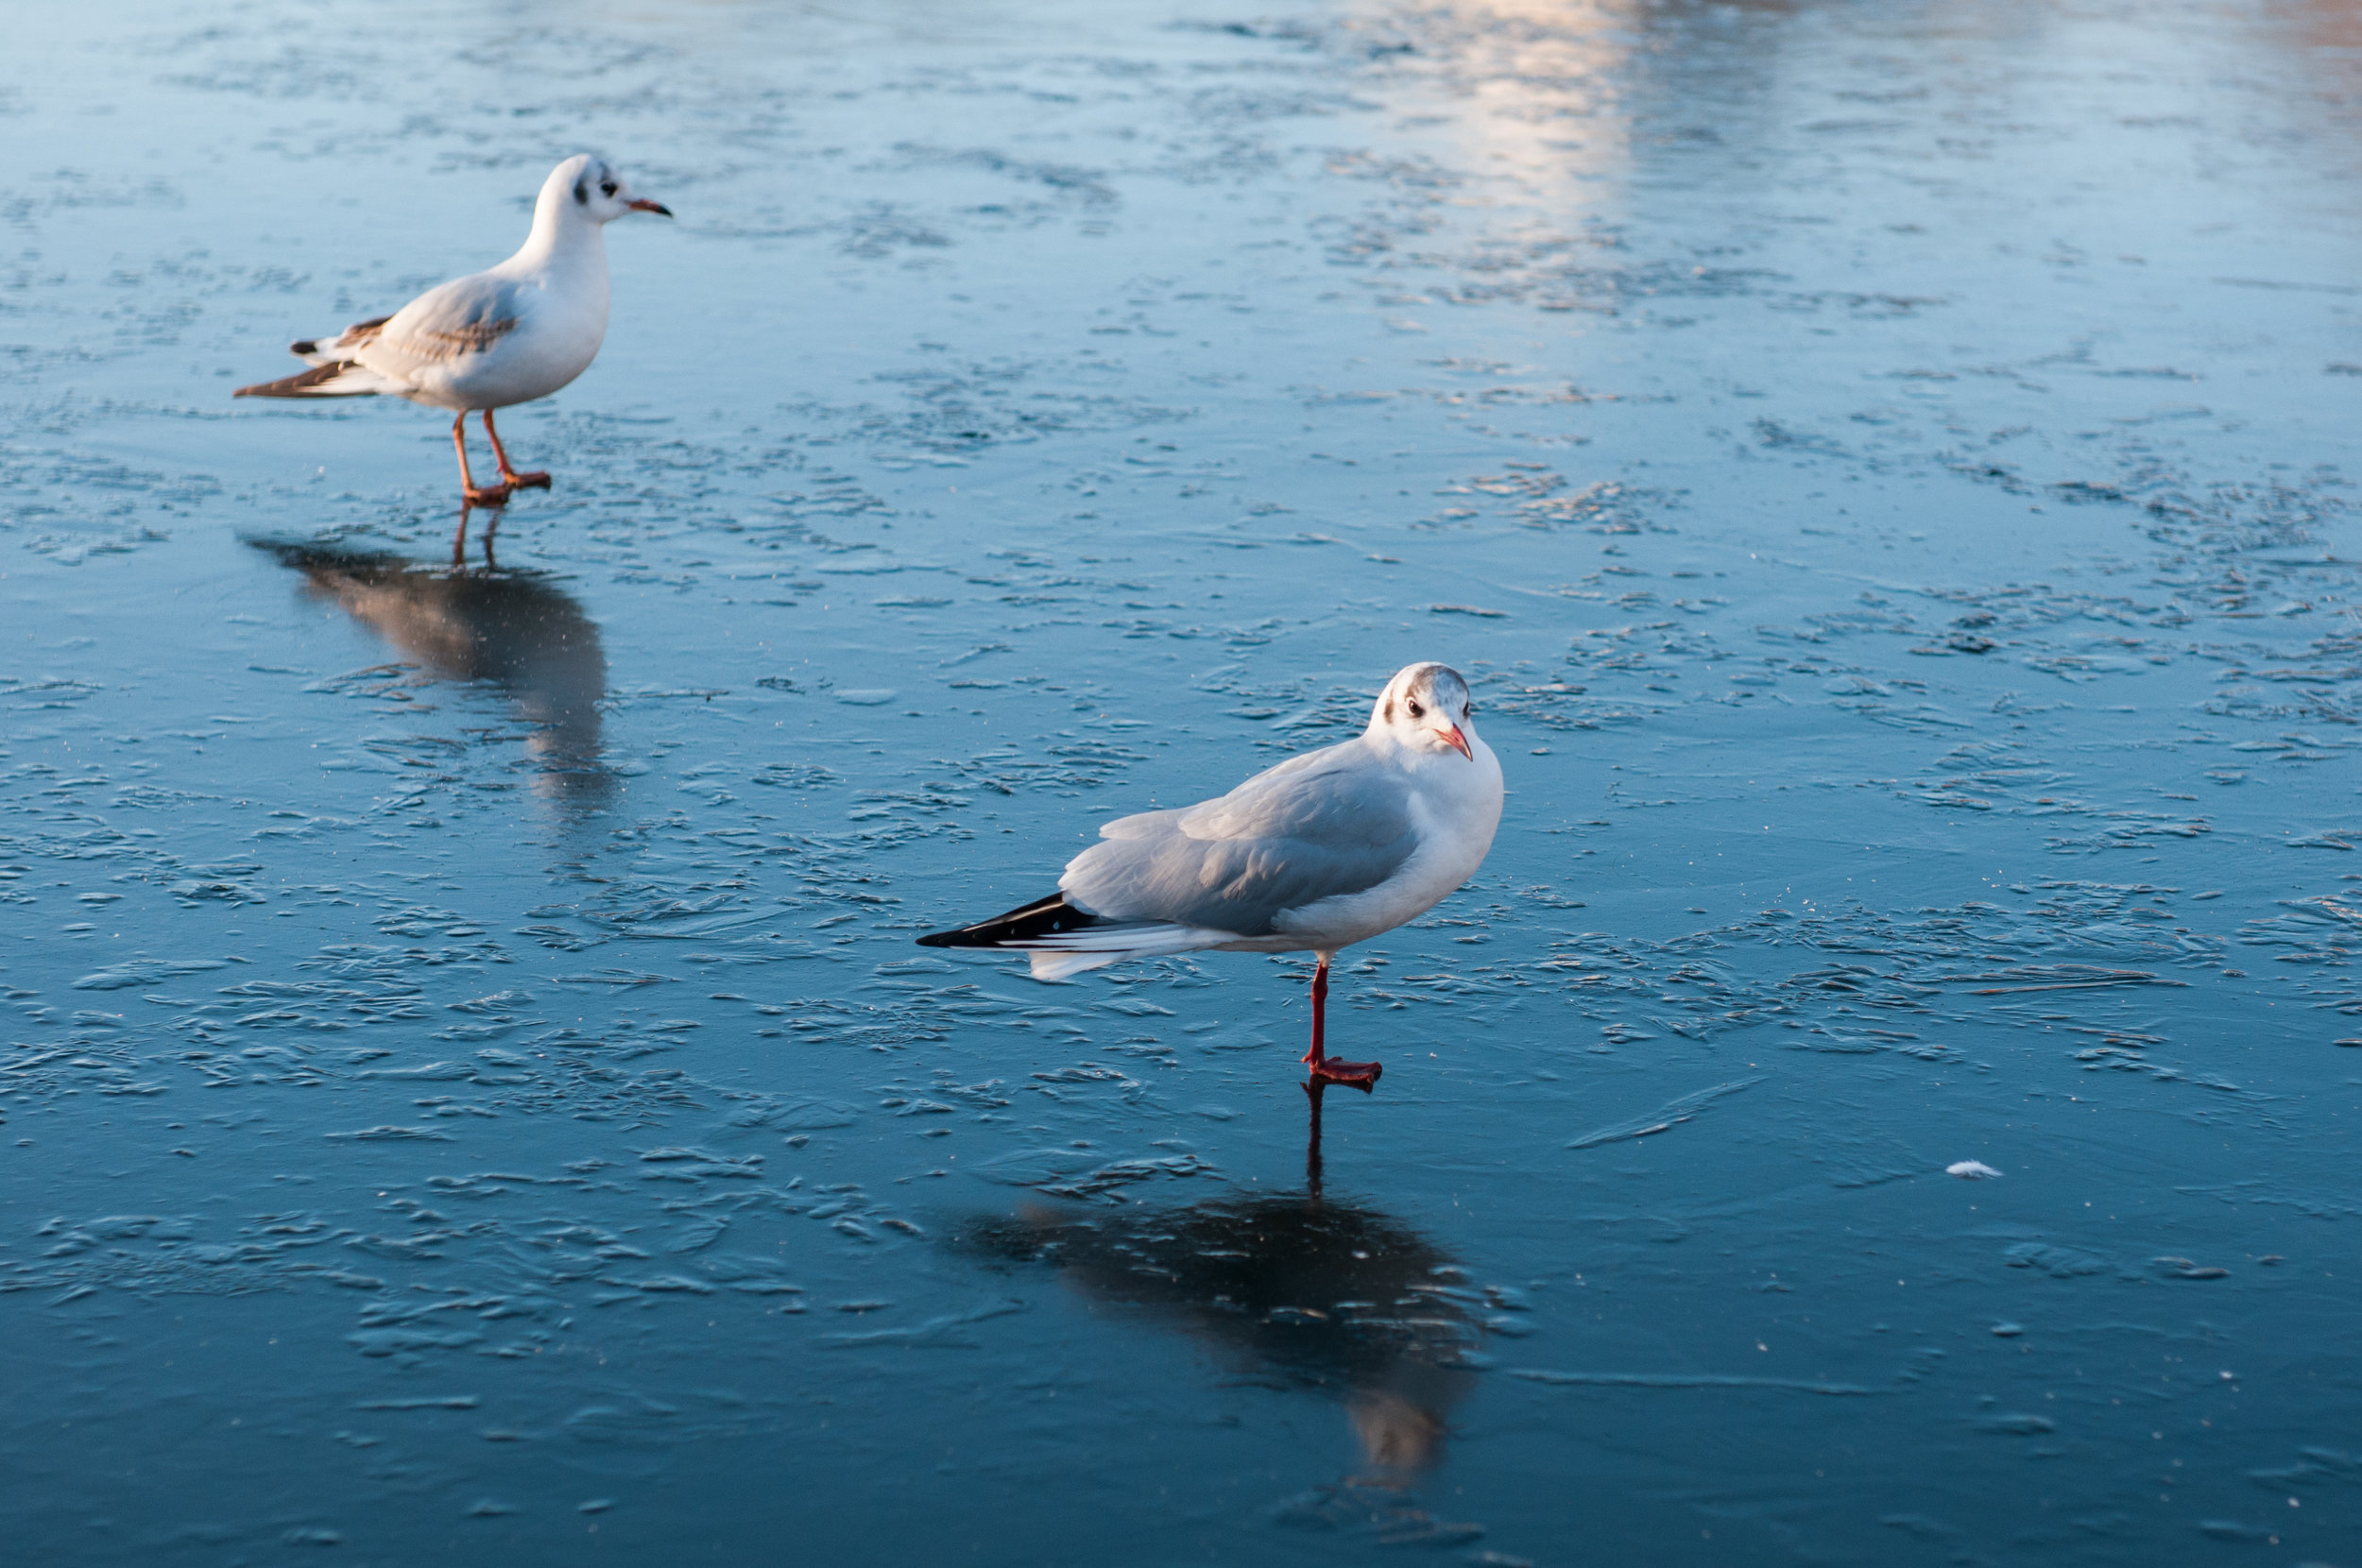 Ptaki lochend park - 2019 - MAR_2548.jpg